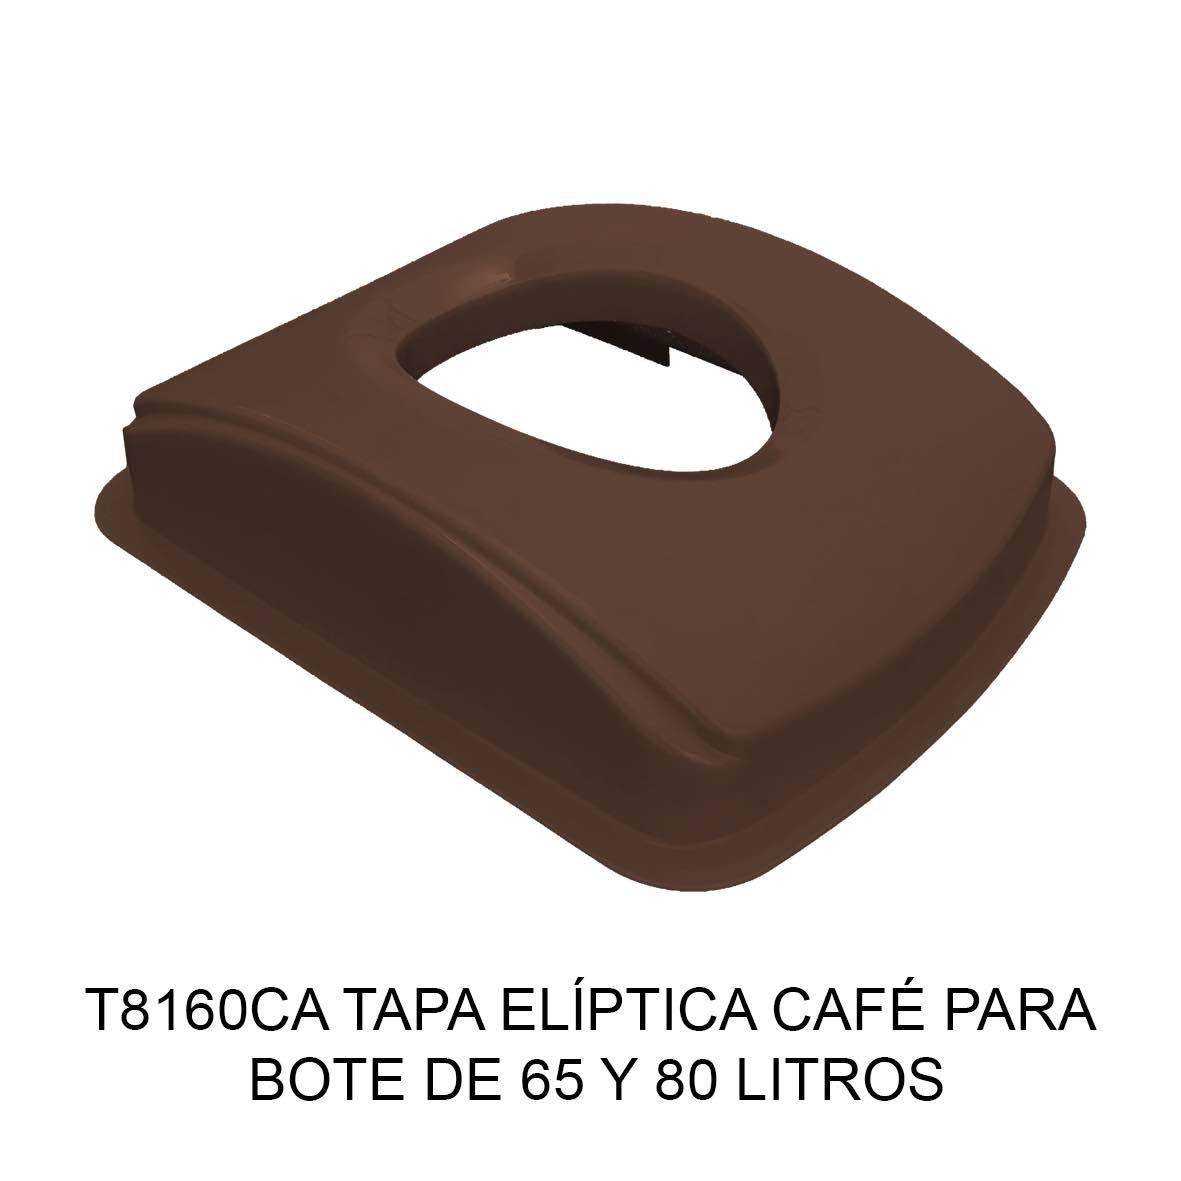 Tapa elíptica para bote de basura color café para botes de 65 y 80 litros Modelo T8160CA de Sablón